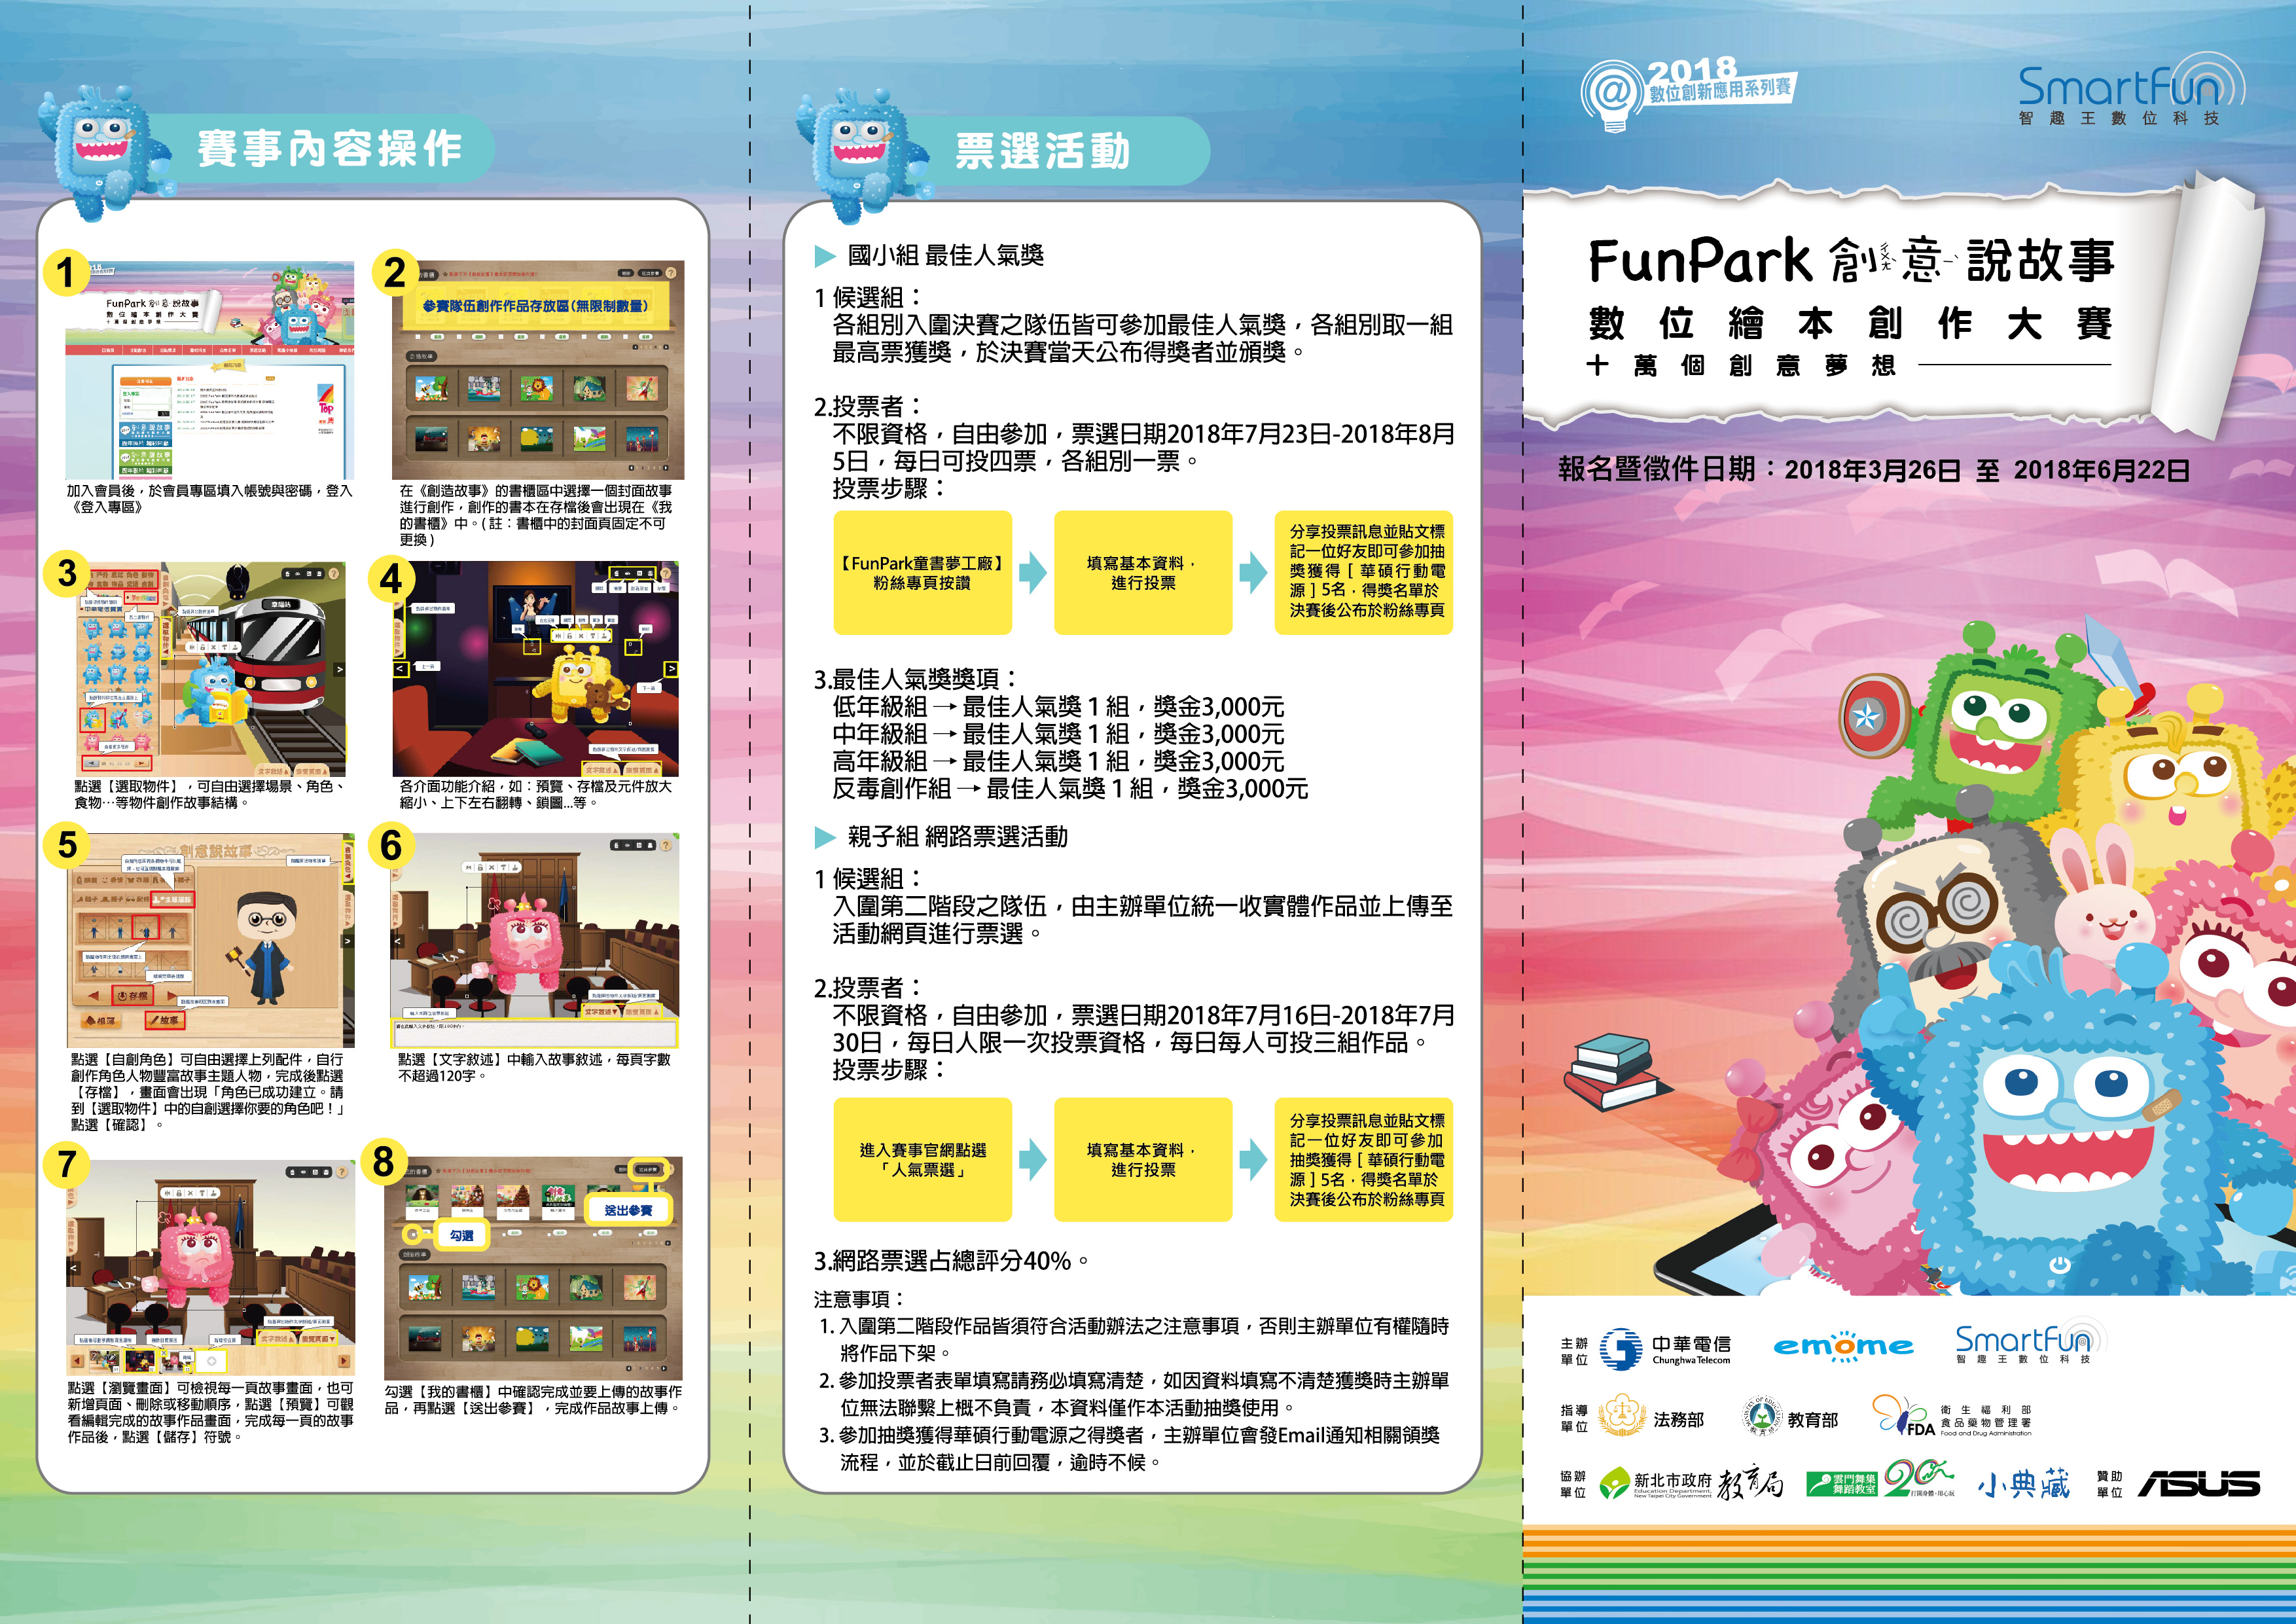 2018「FunPark創意說故事─數位繪本創作大賽」活動